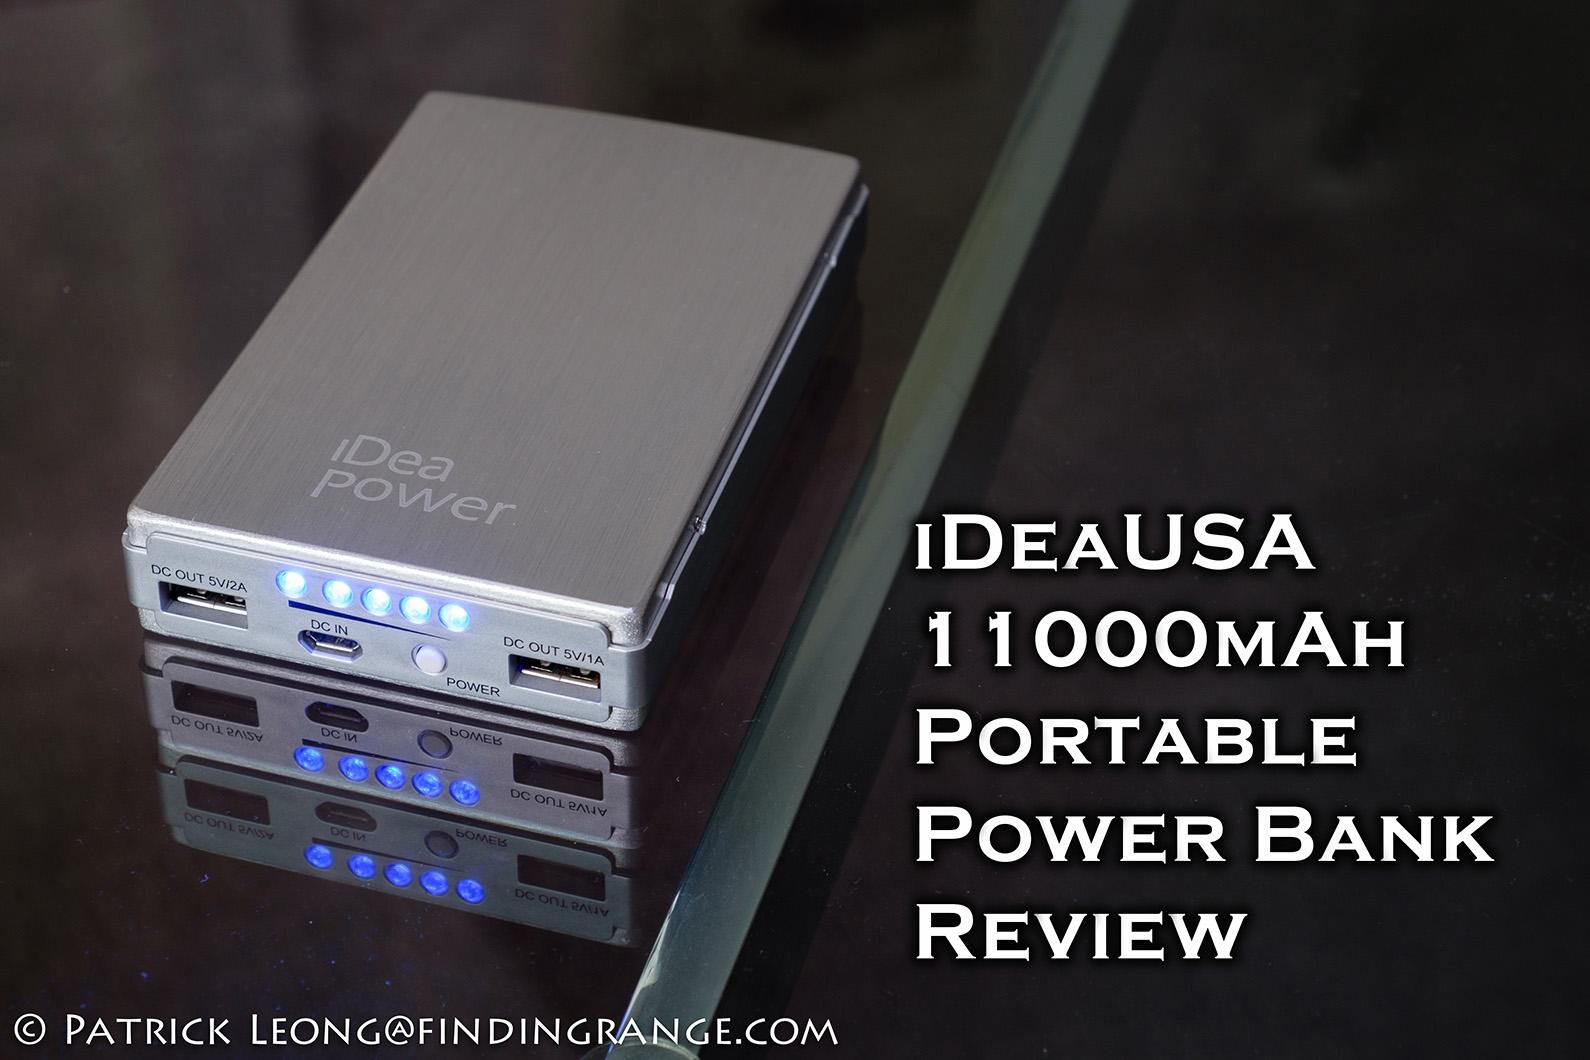 iDeaUSA-11000mAh-Portable-Power-Bank-Review-1